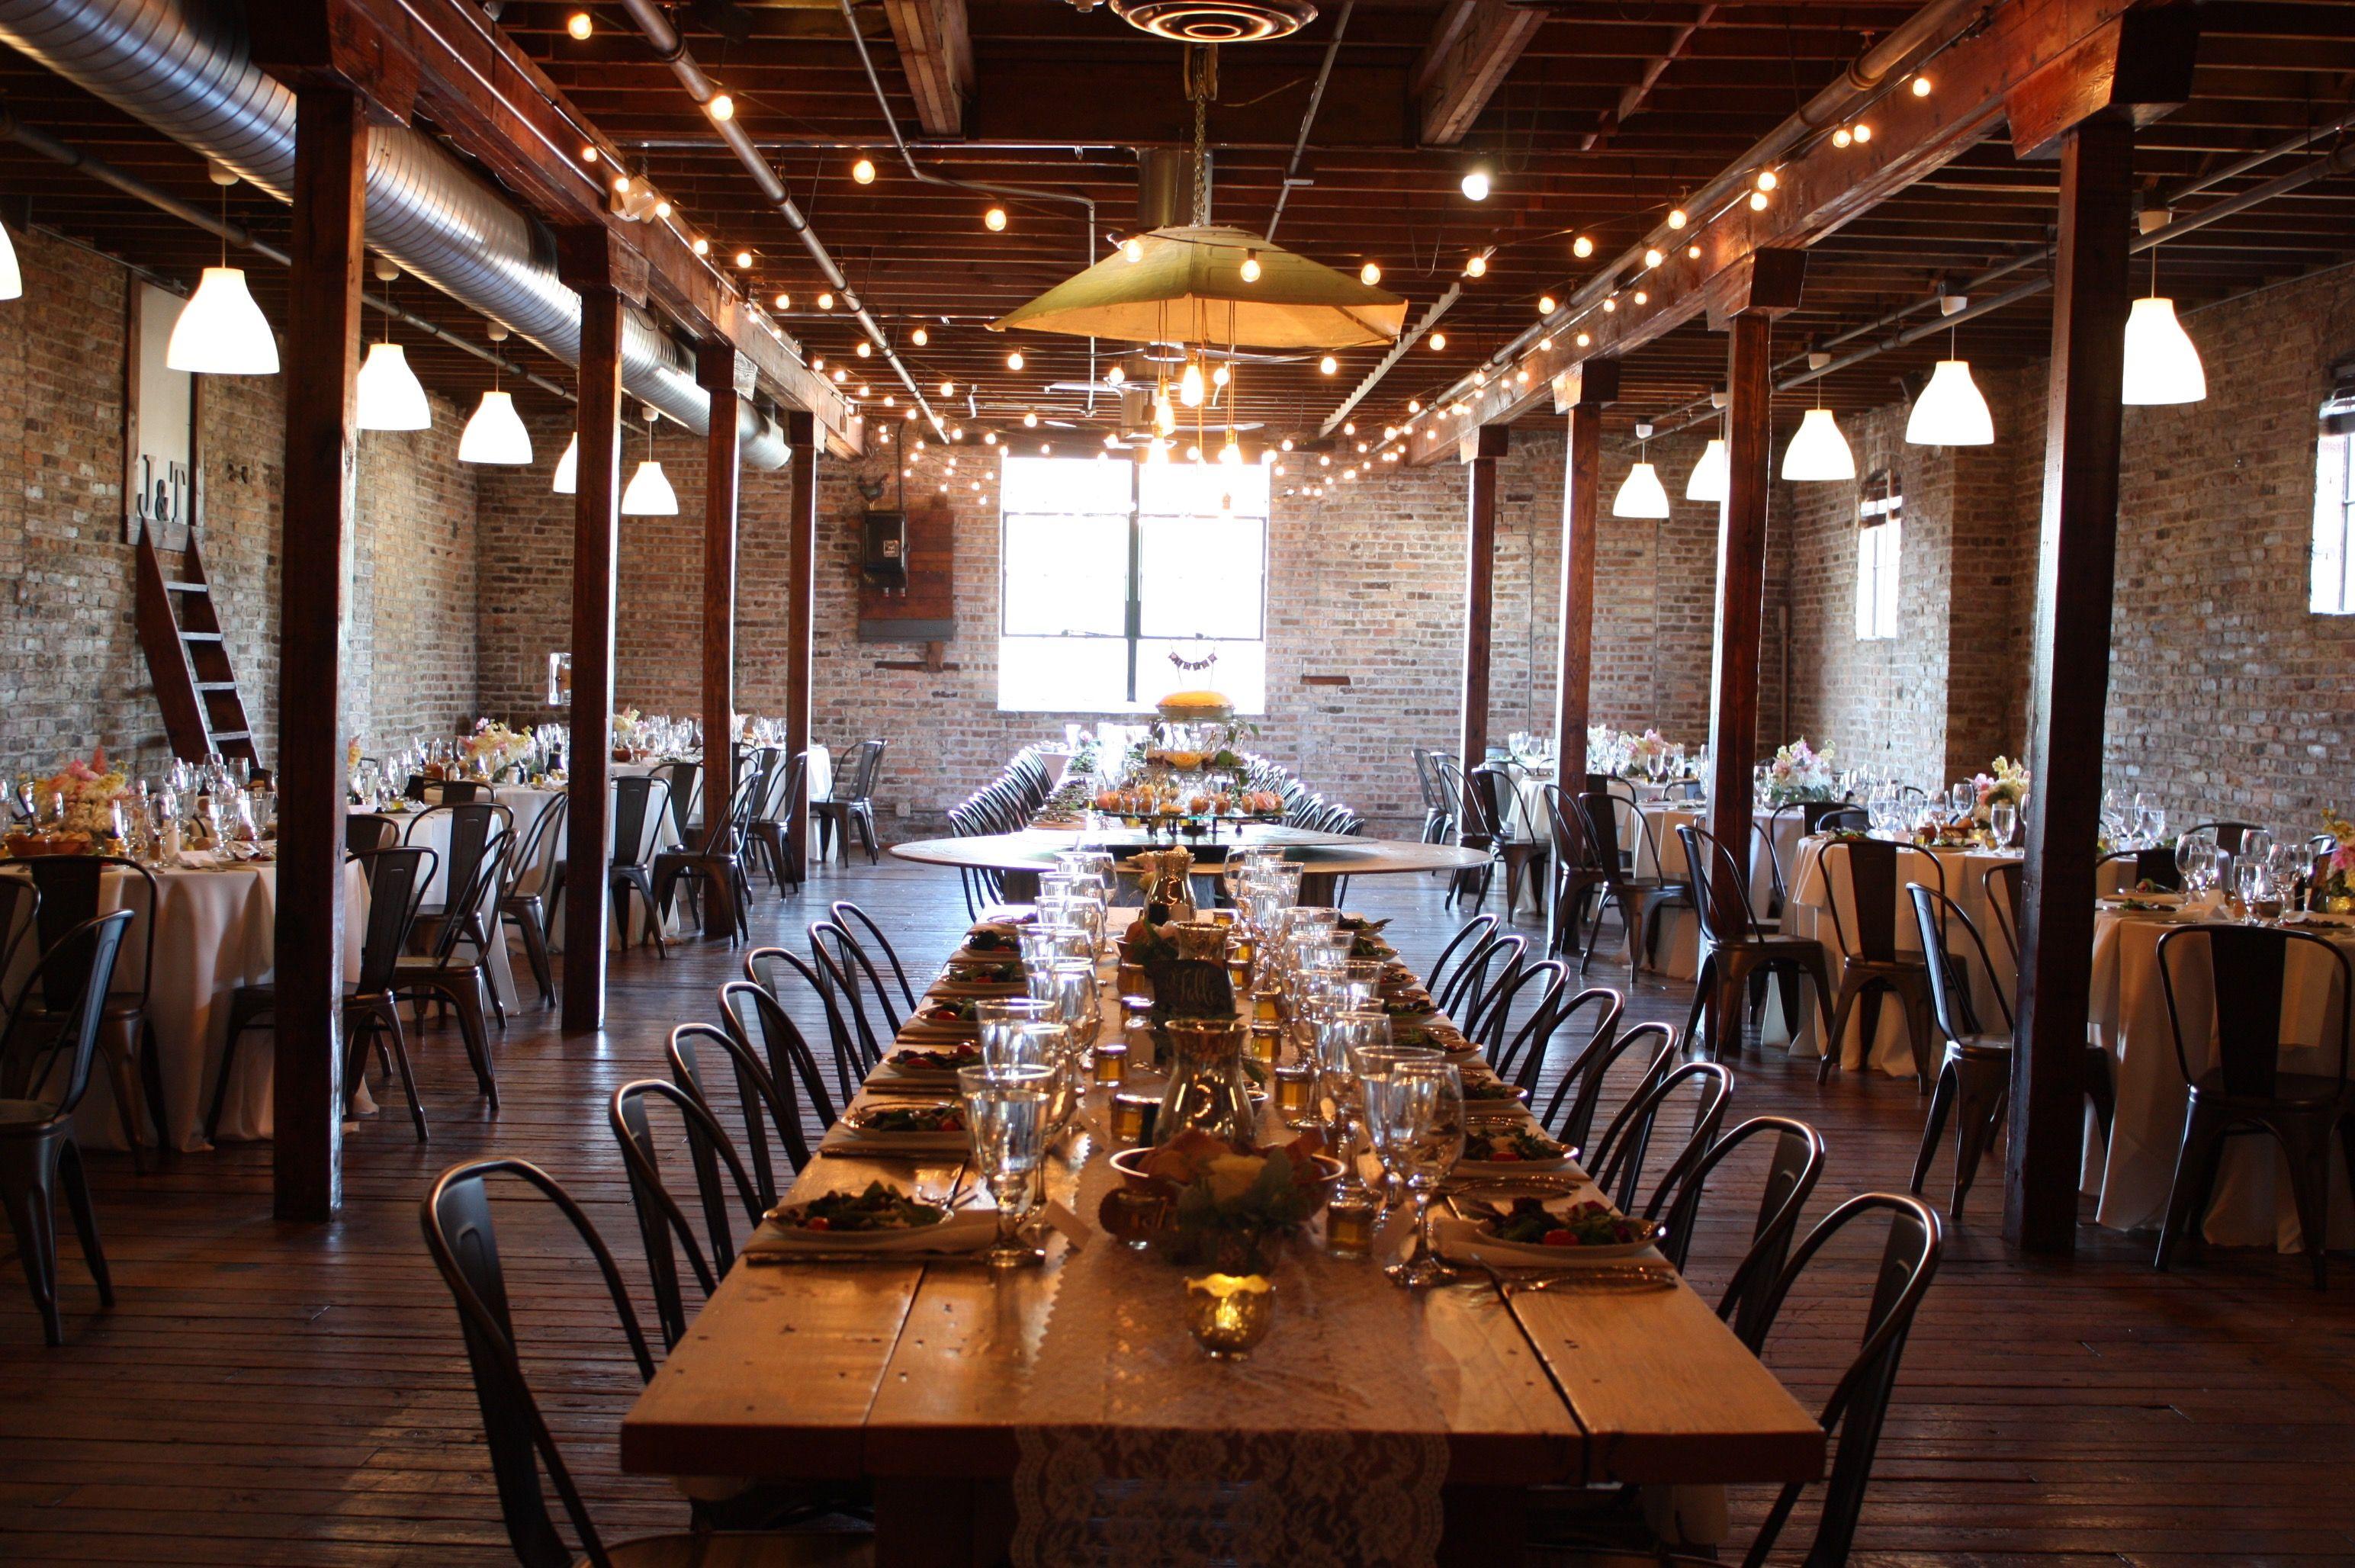 The Haight Rustic Wedding Venue in Chicago, IL